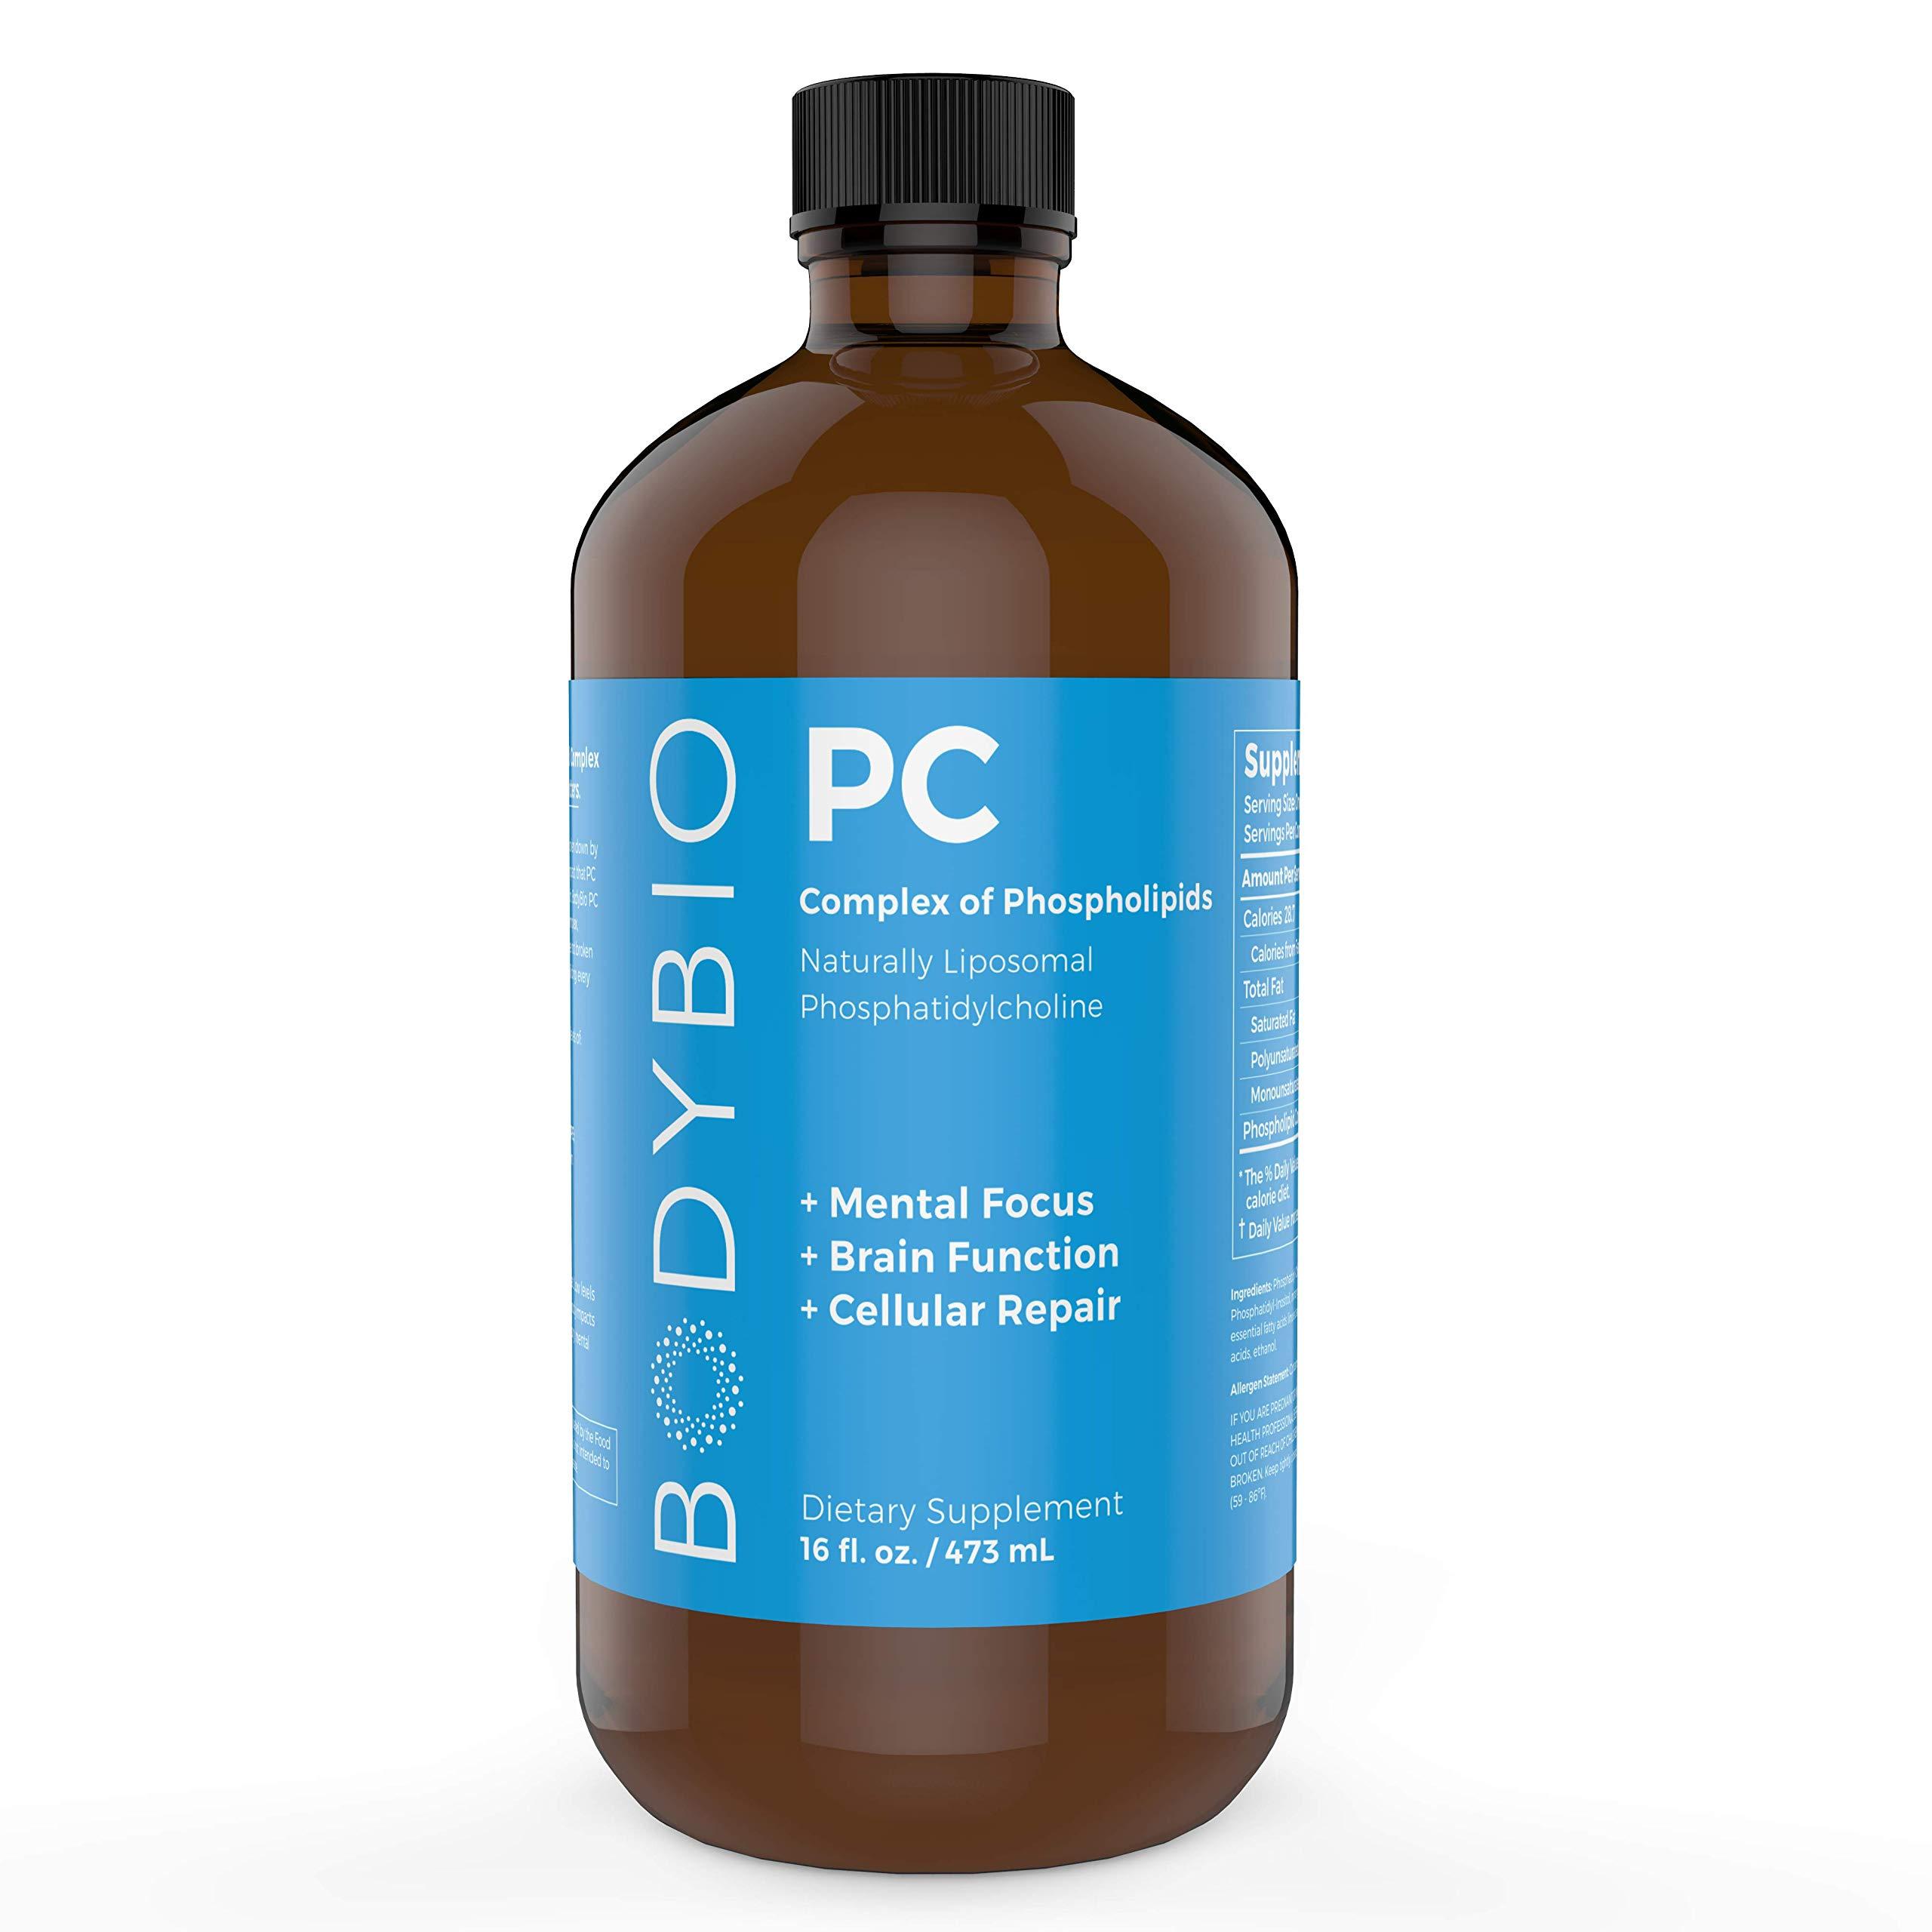 BodyBio - PC Phosphatidylcholine Liquid, Phospholipid Complex, 16oz